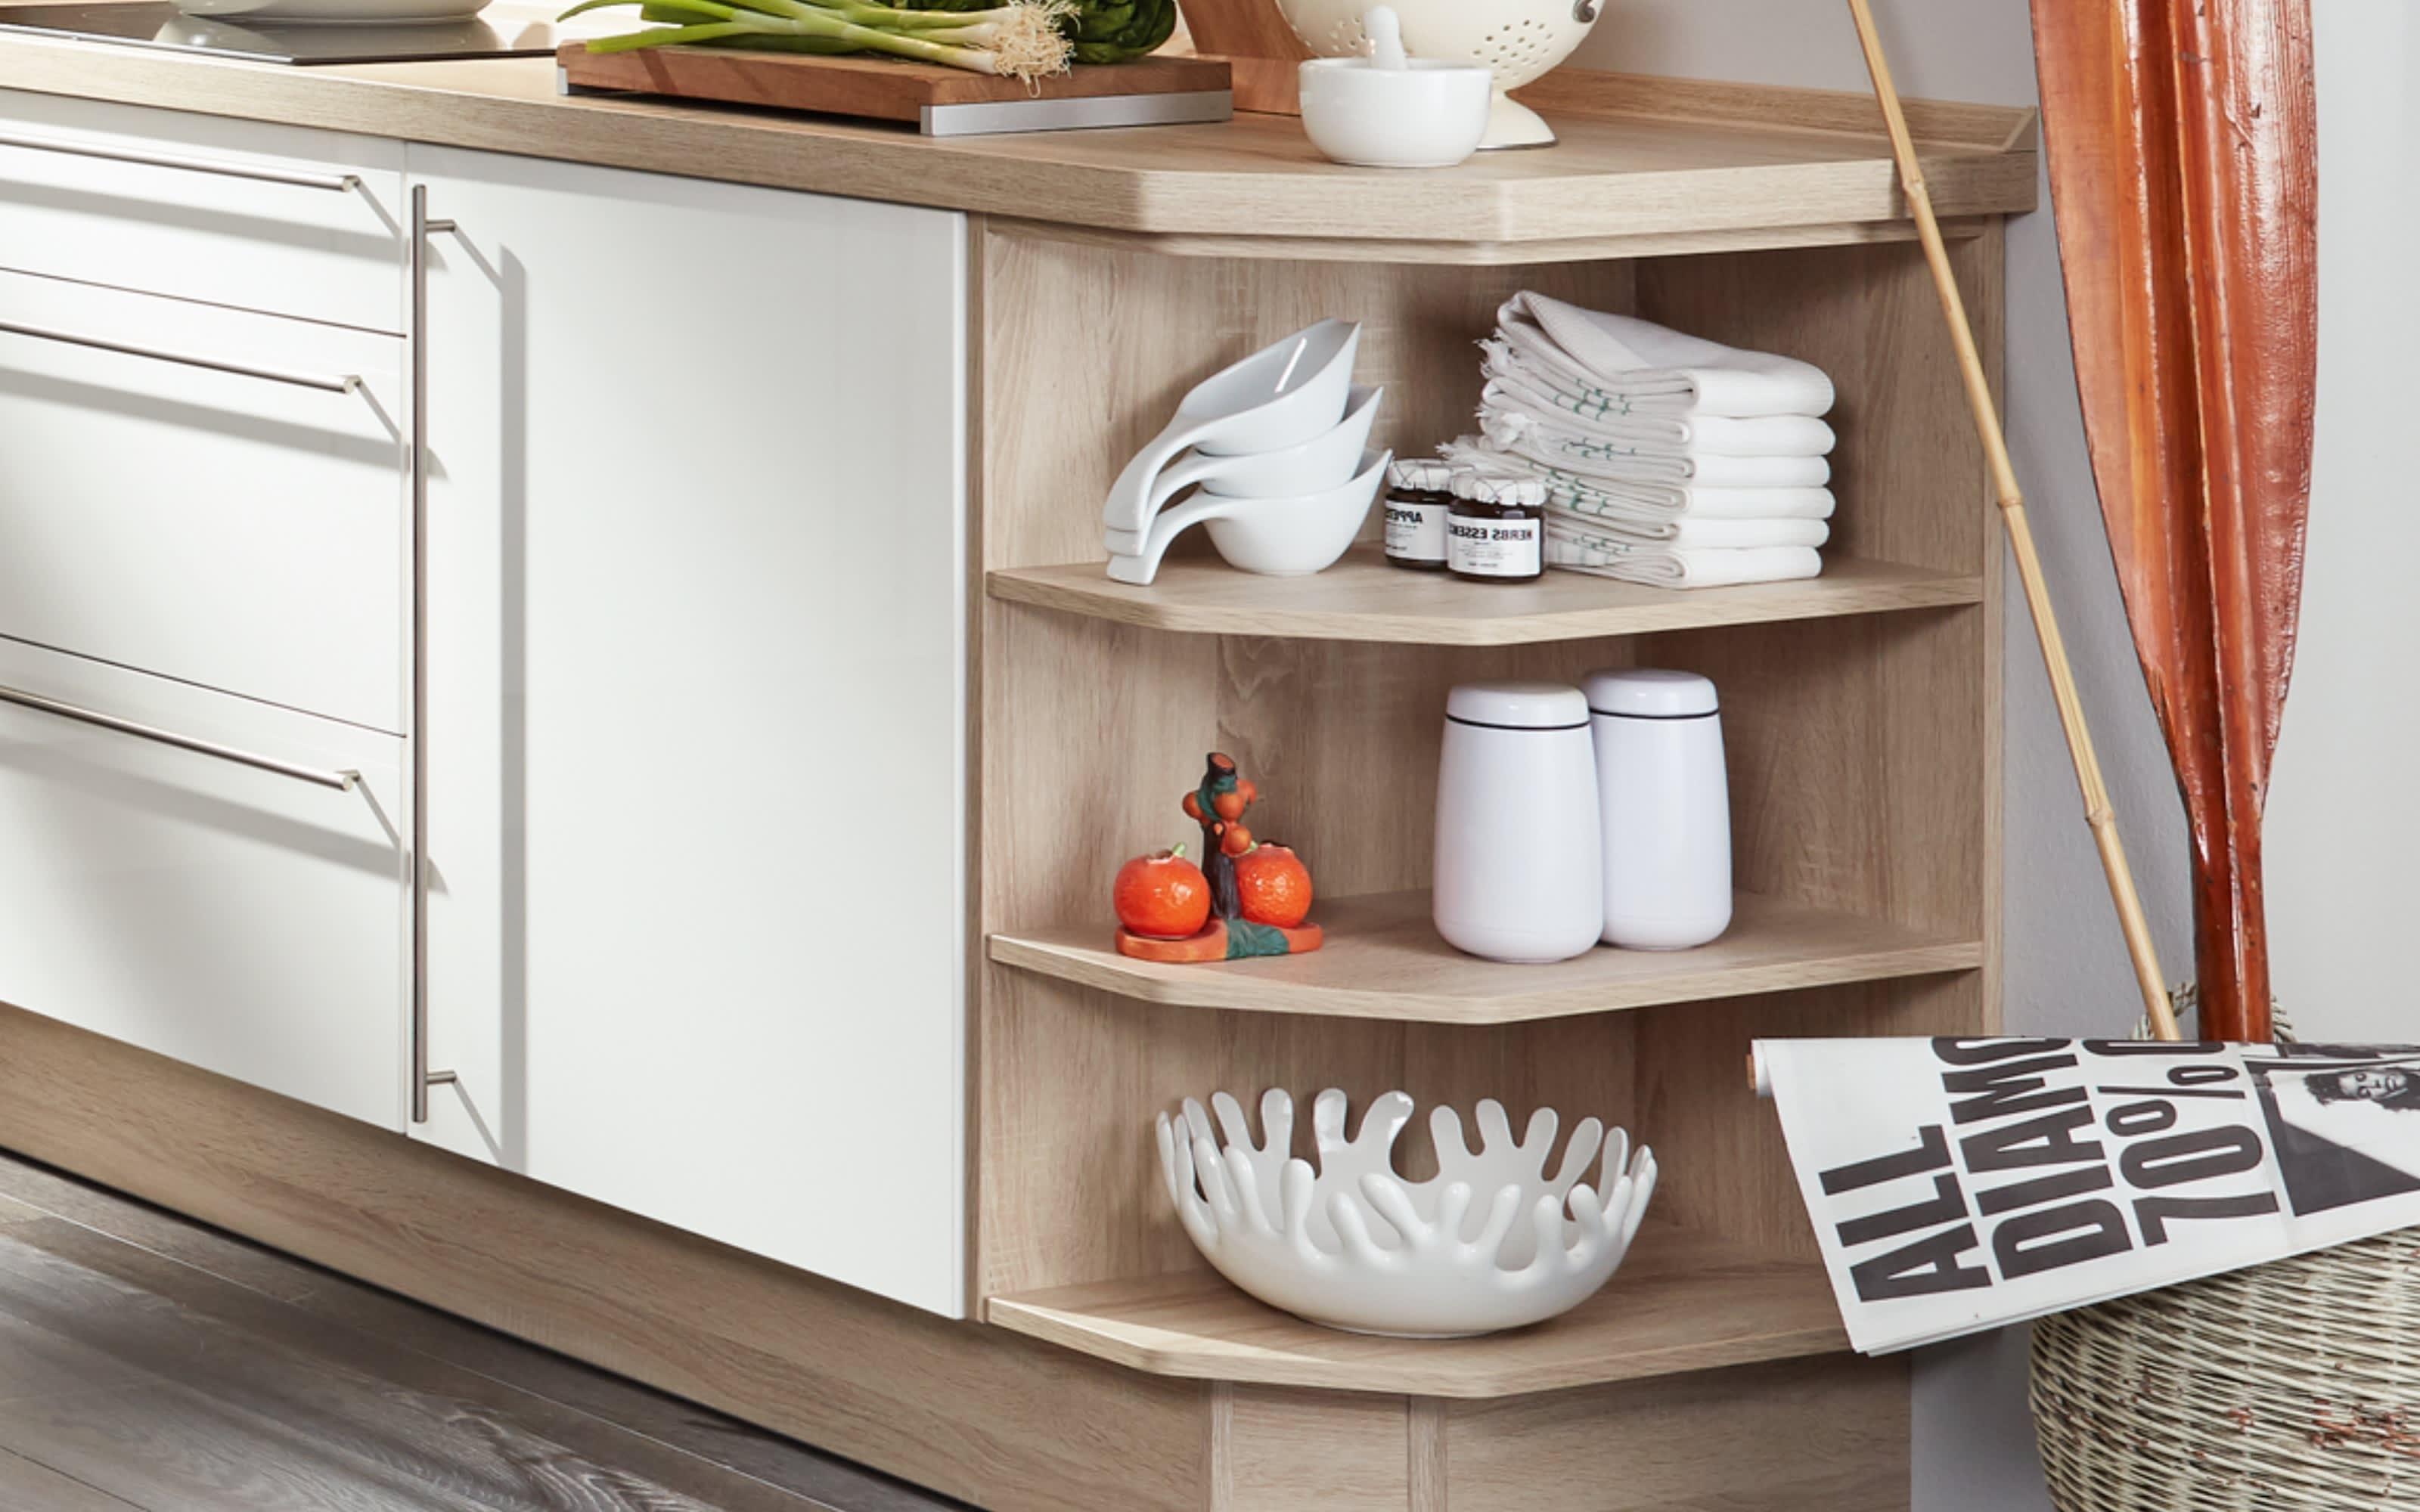 Einbauküche Flash, Hochglanz Lacklaminat magnolia, inklusive Elektrogeräte